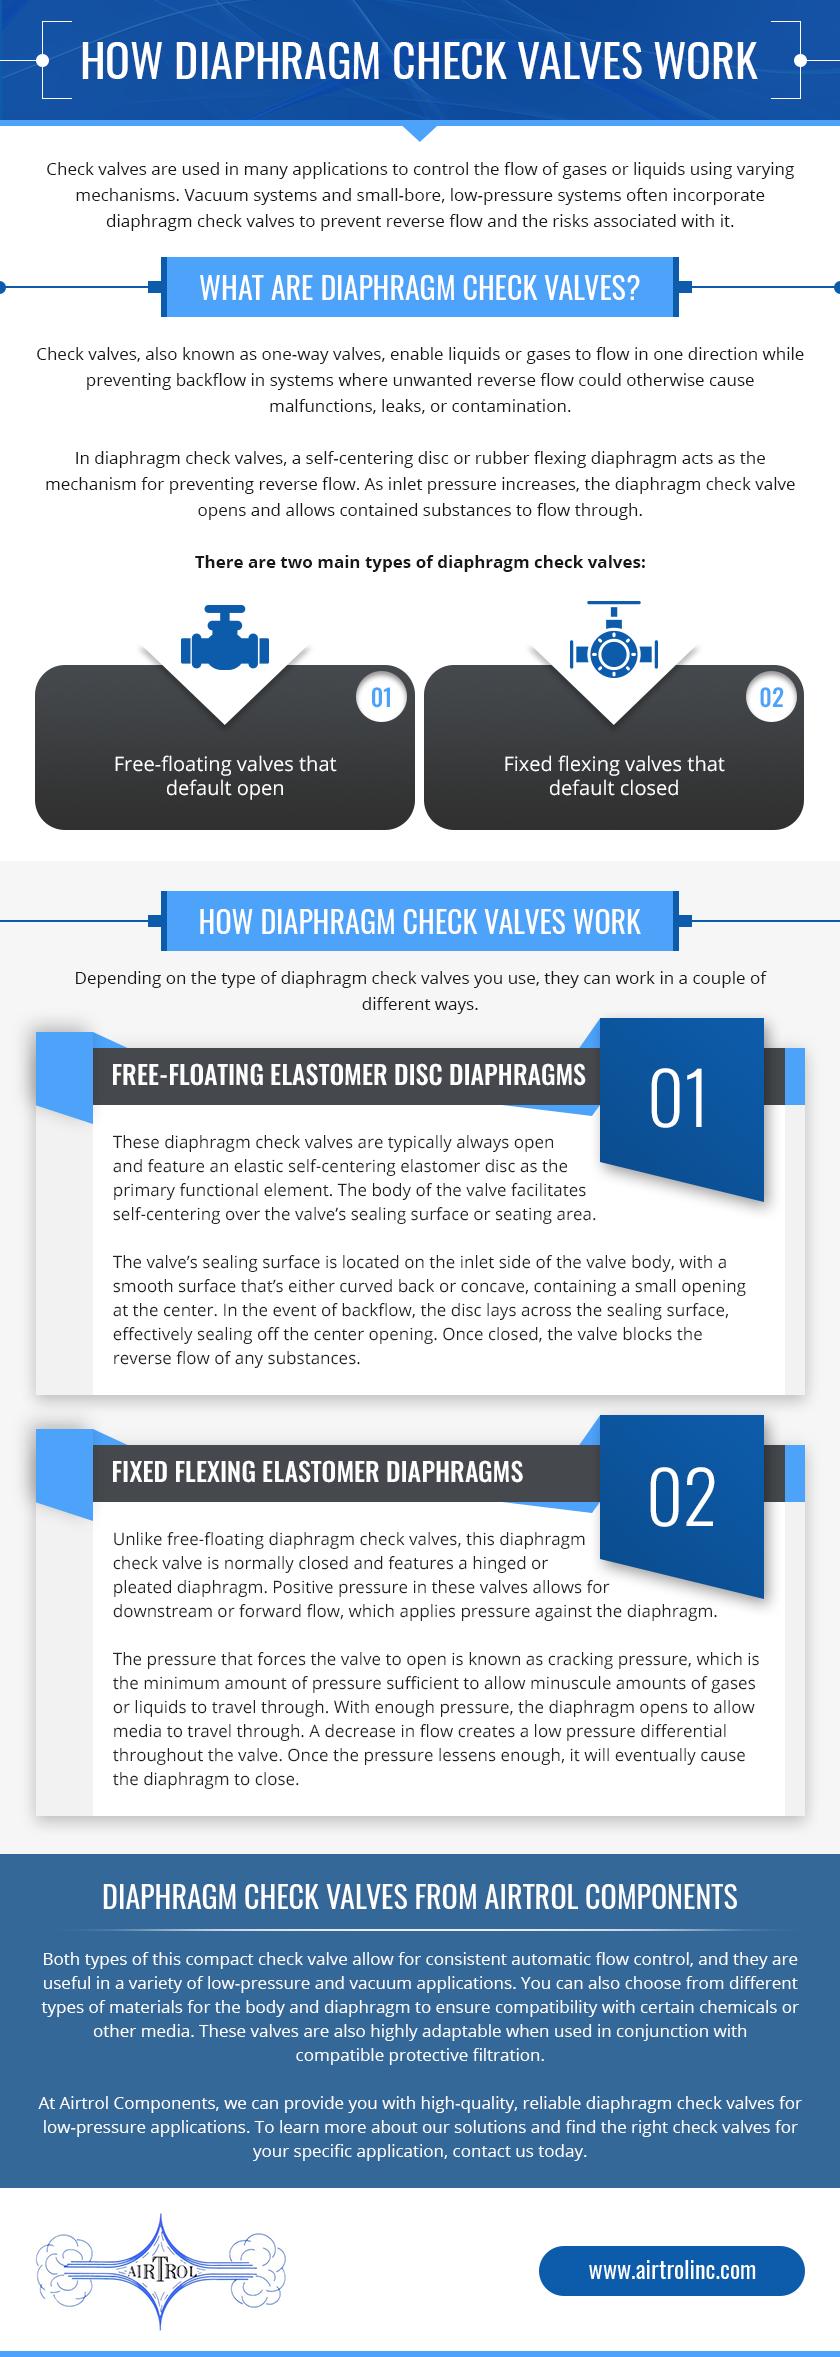 How Diaphragm Check Valves Work